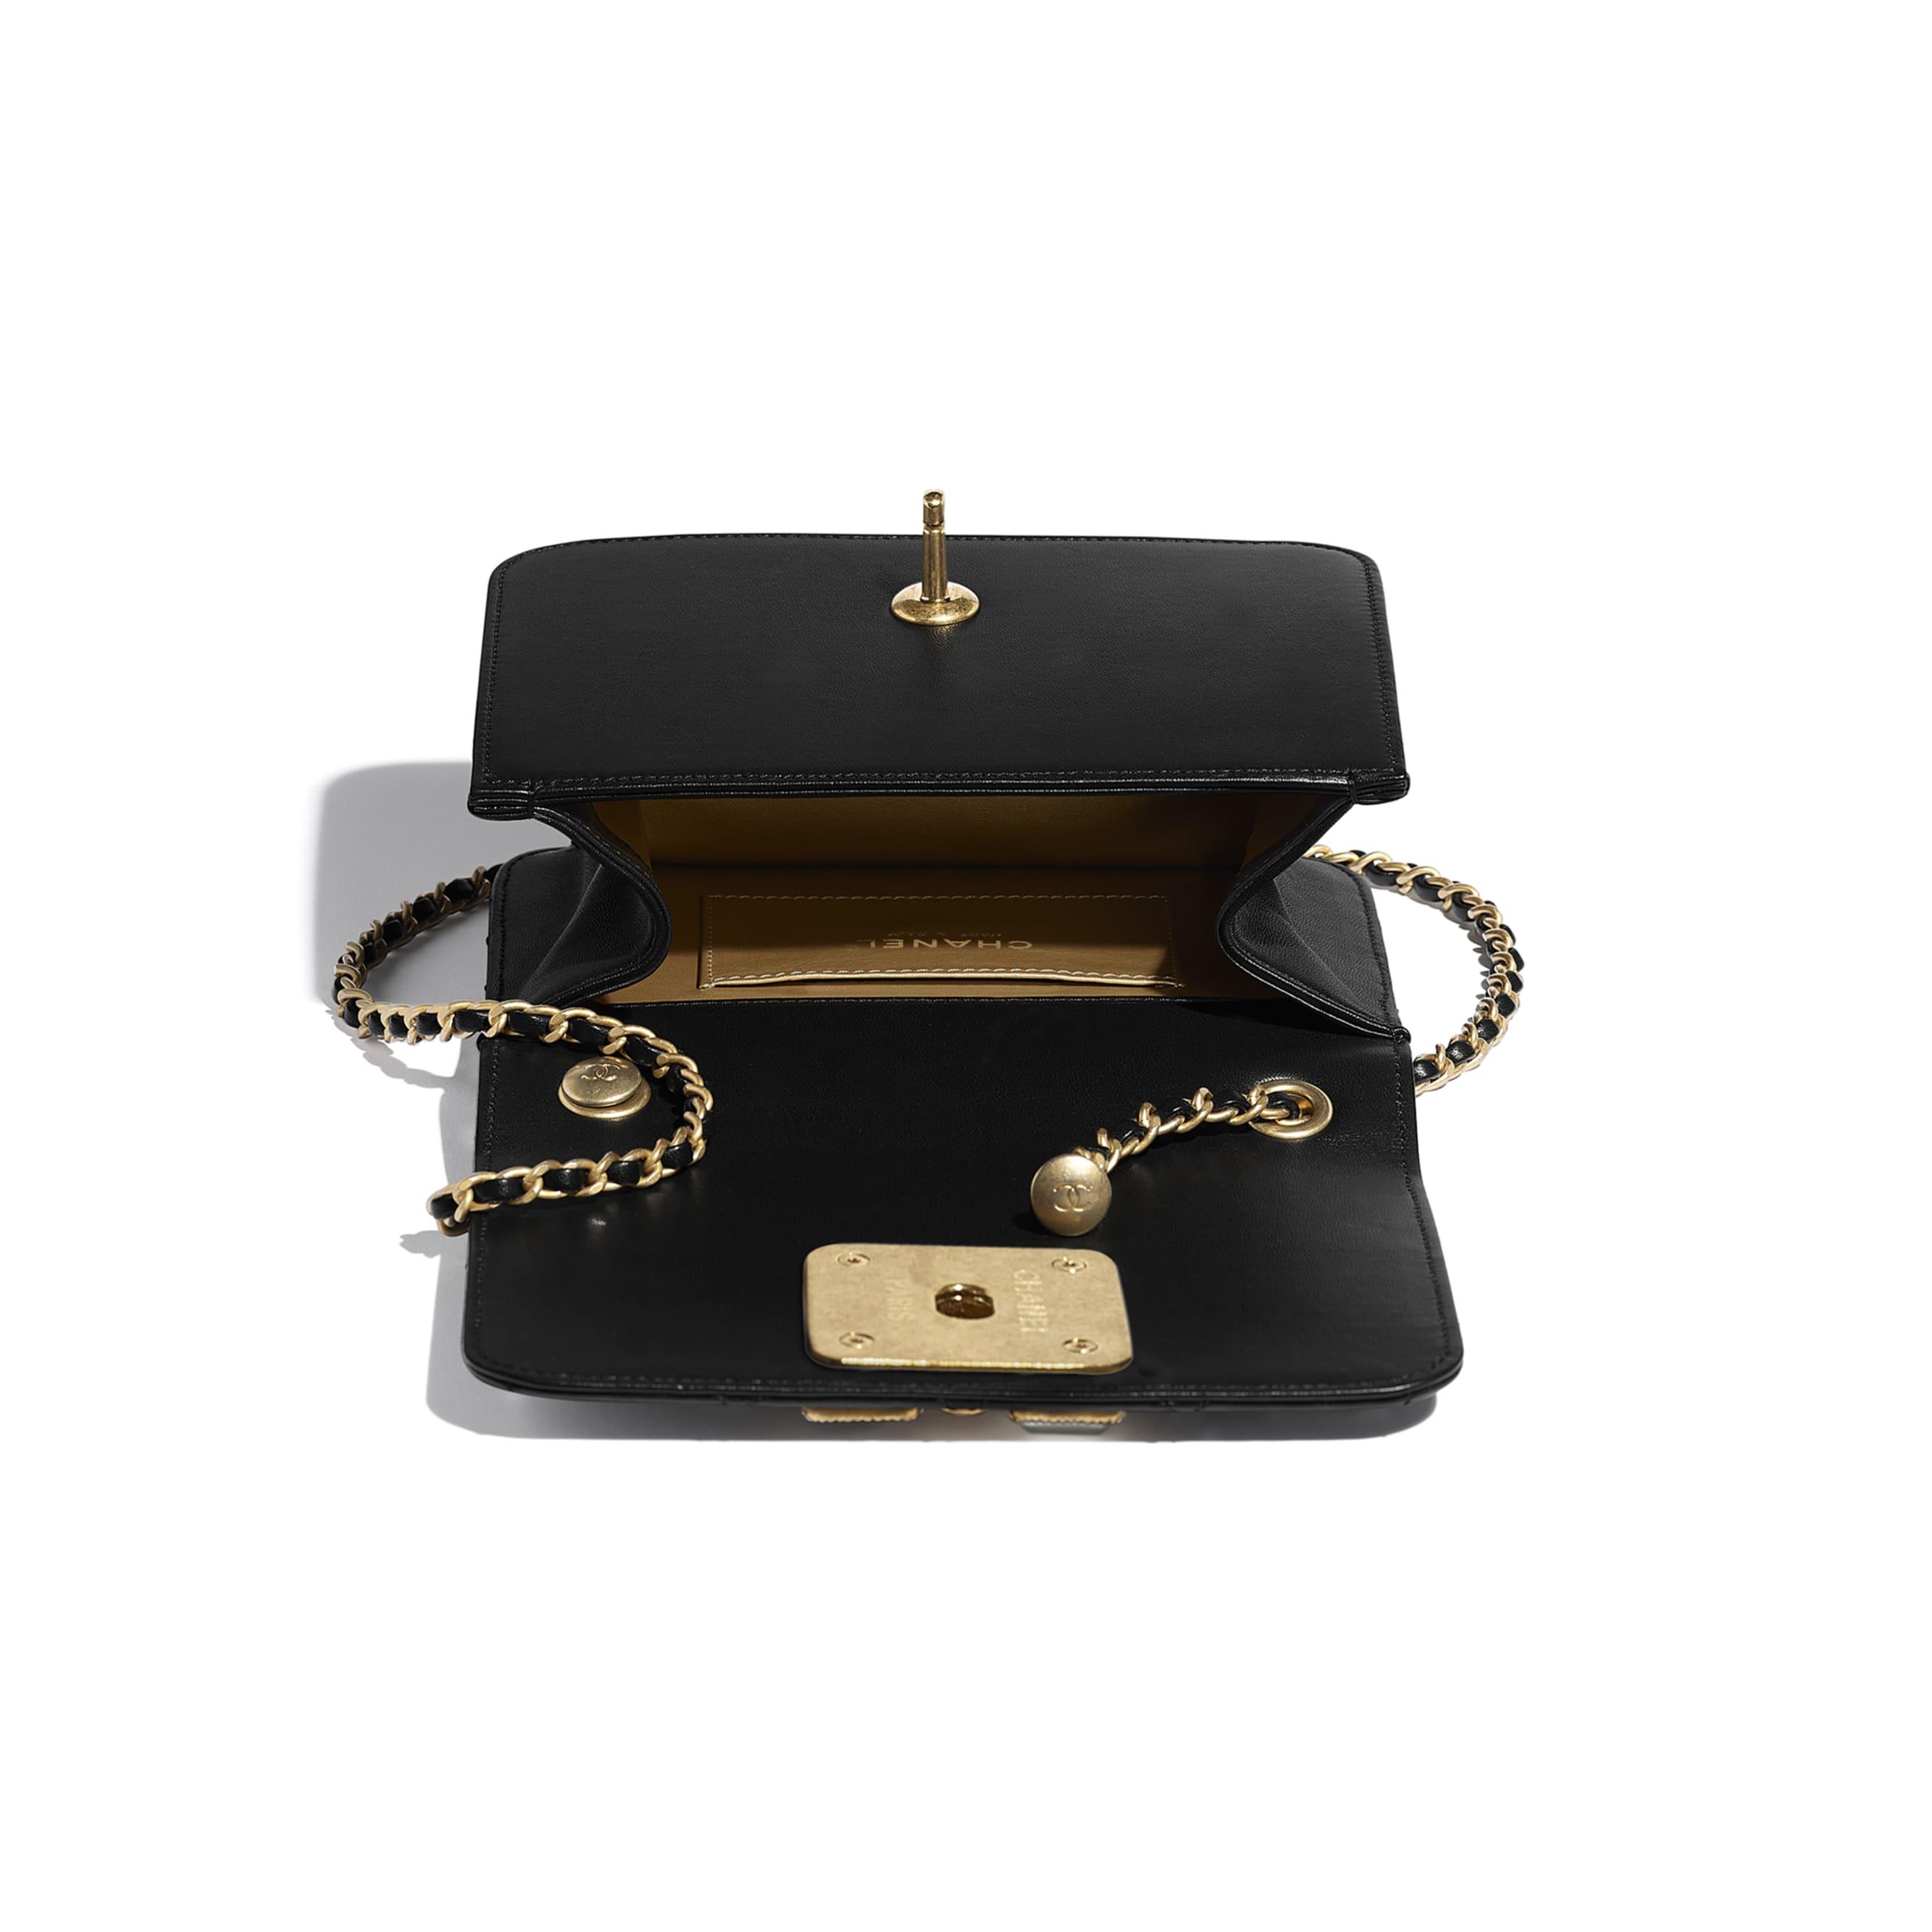 Bolsa - Black & White - Calfskin, Crystal Pearls, Resin & Gold-Tone Metal - CHANEL - Outra vista - ver a versão em tamanho standard